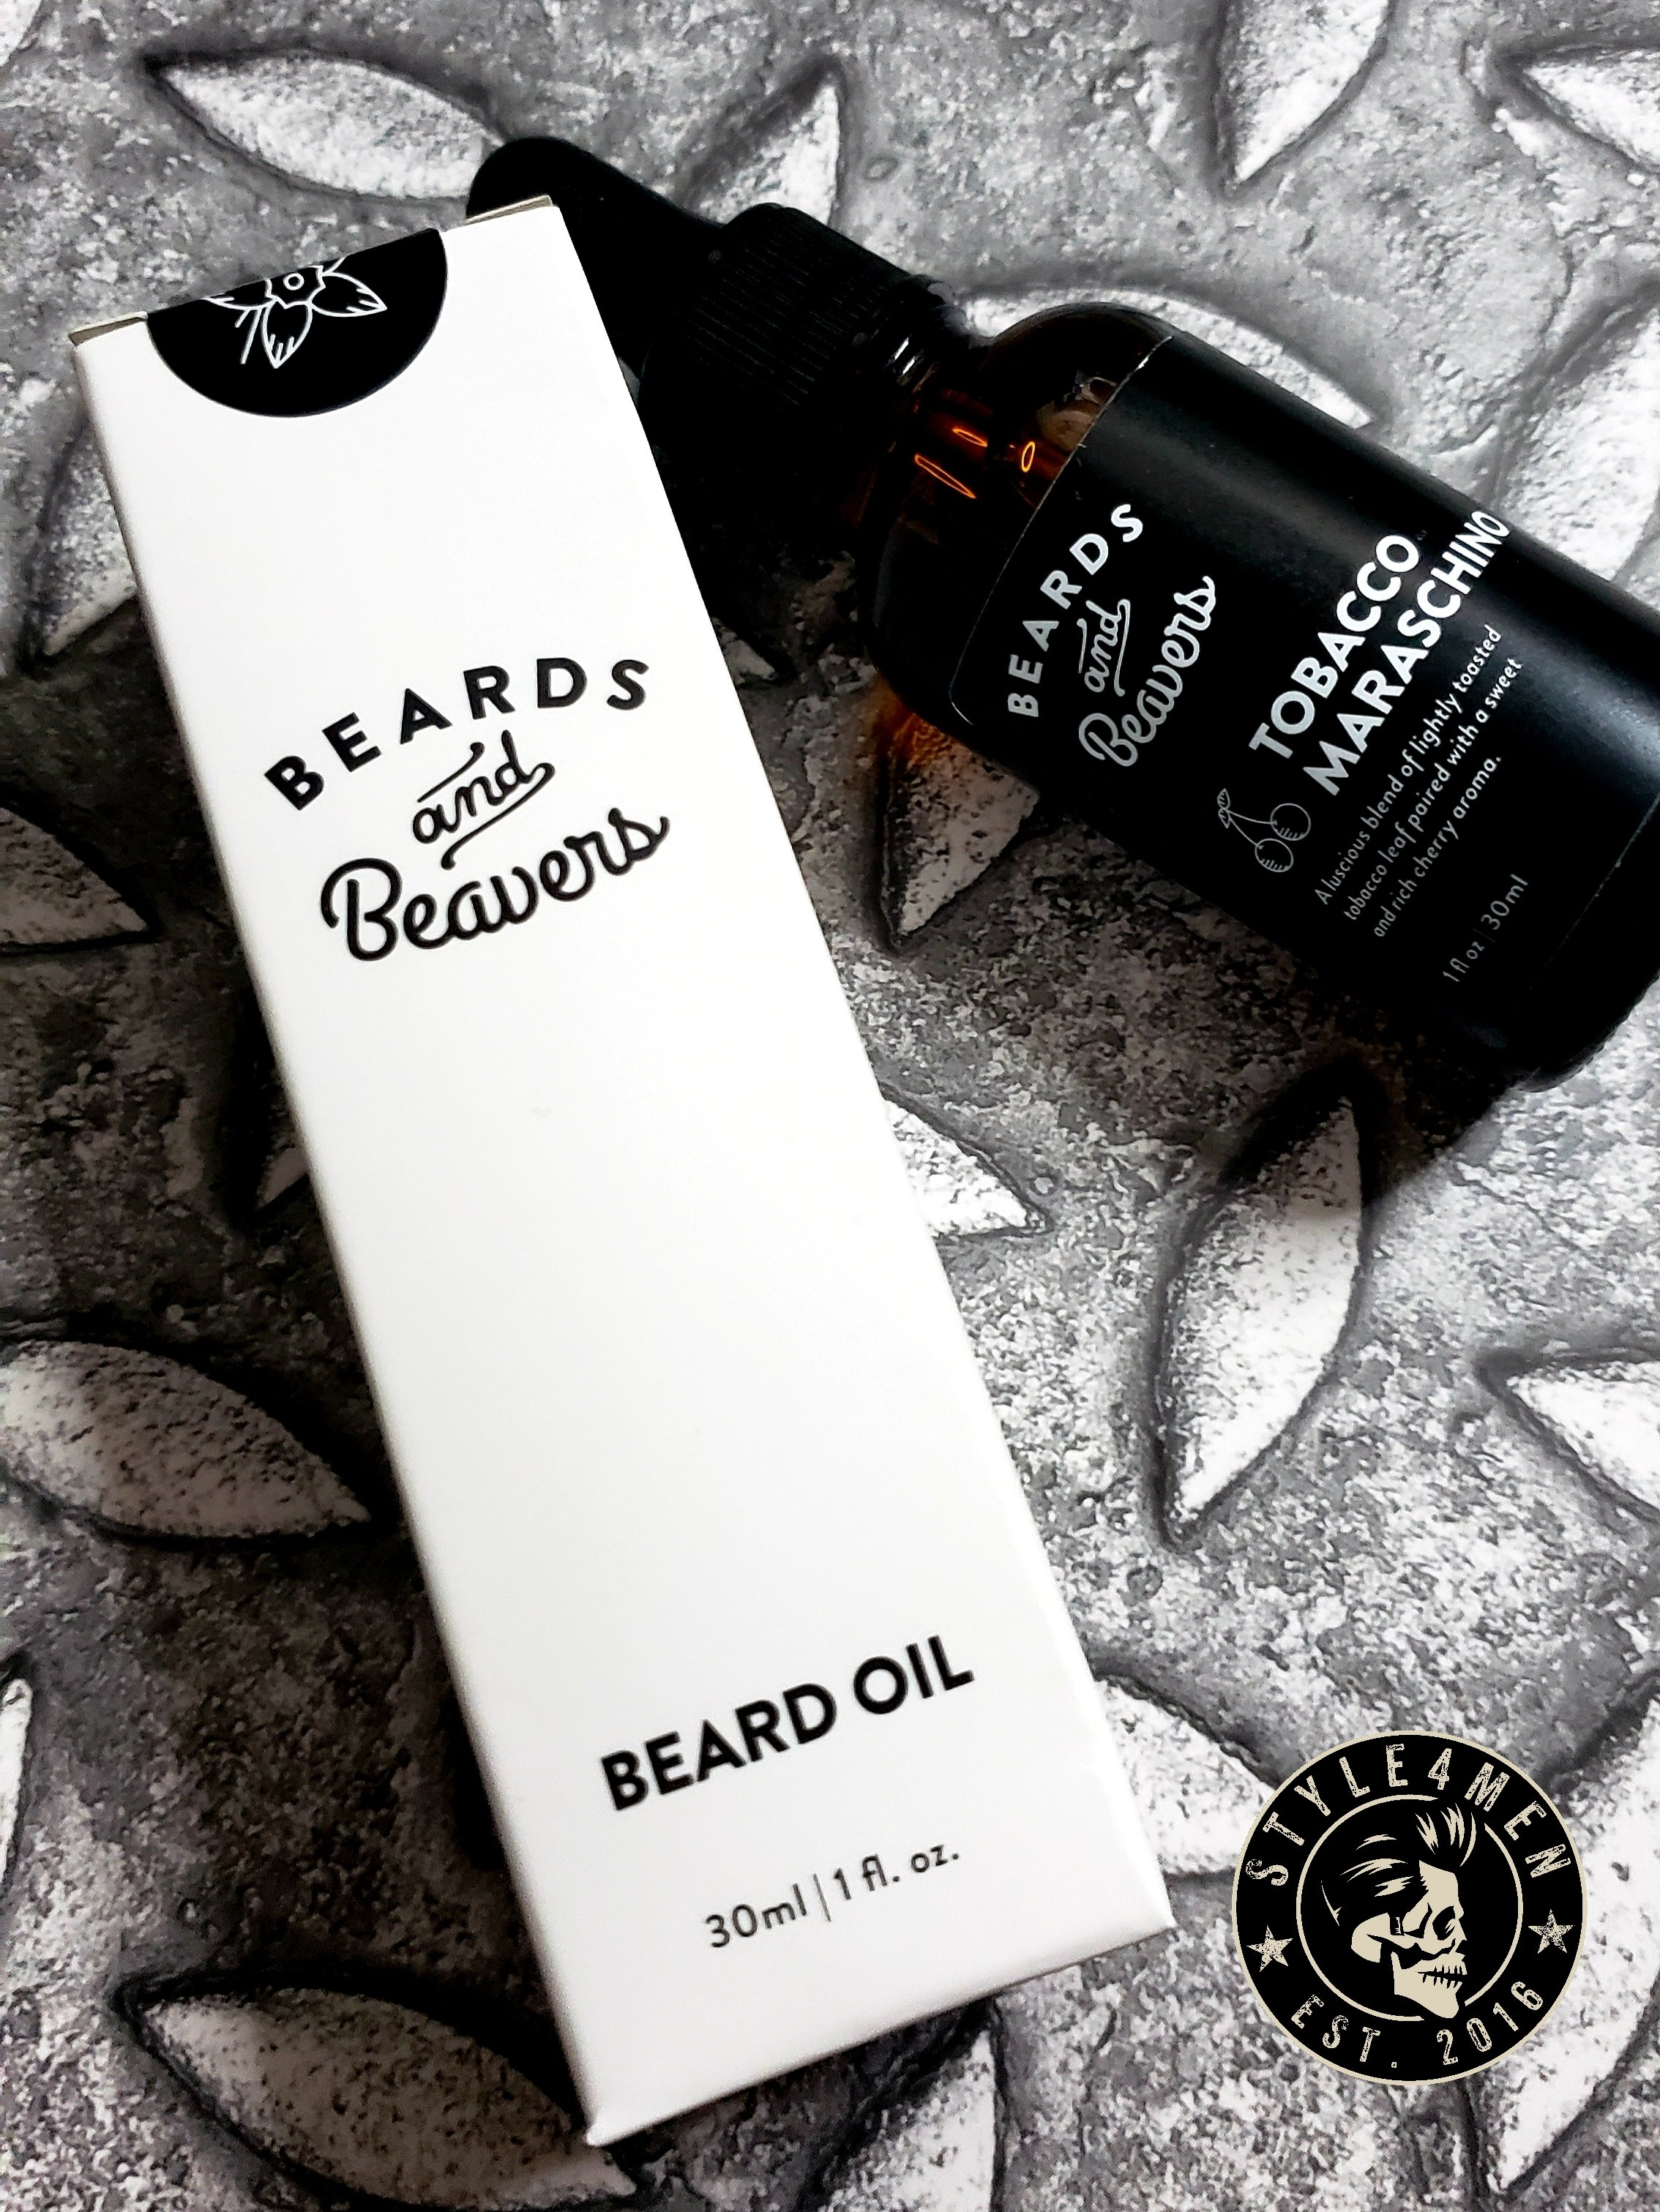 Beards and Beavers oil